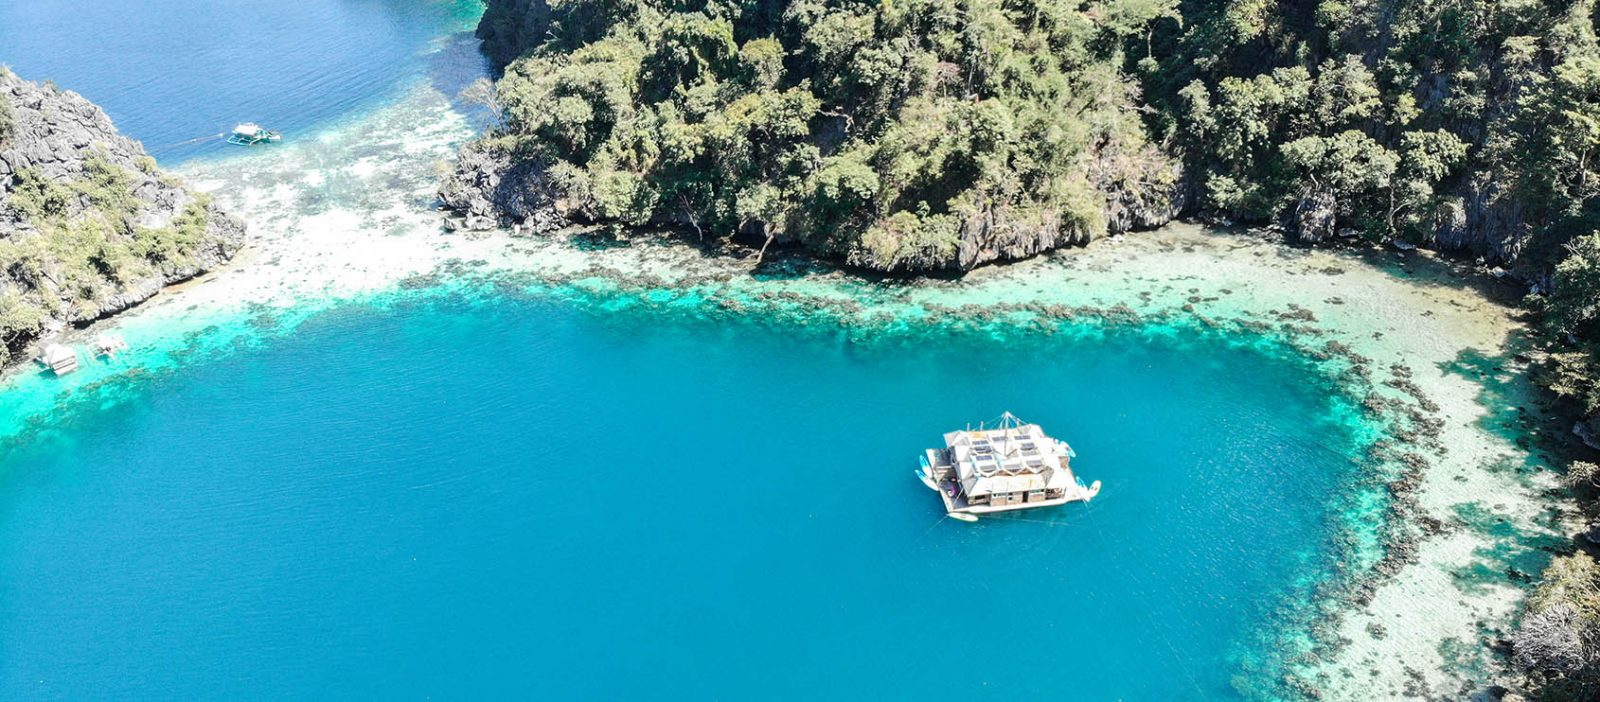 Meilleur-hotel-Coron-Paolyn-Boat-Houses-FMR-traveblog